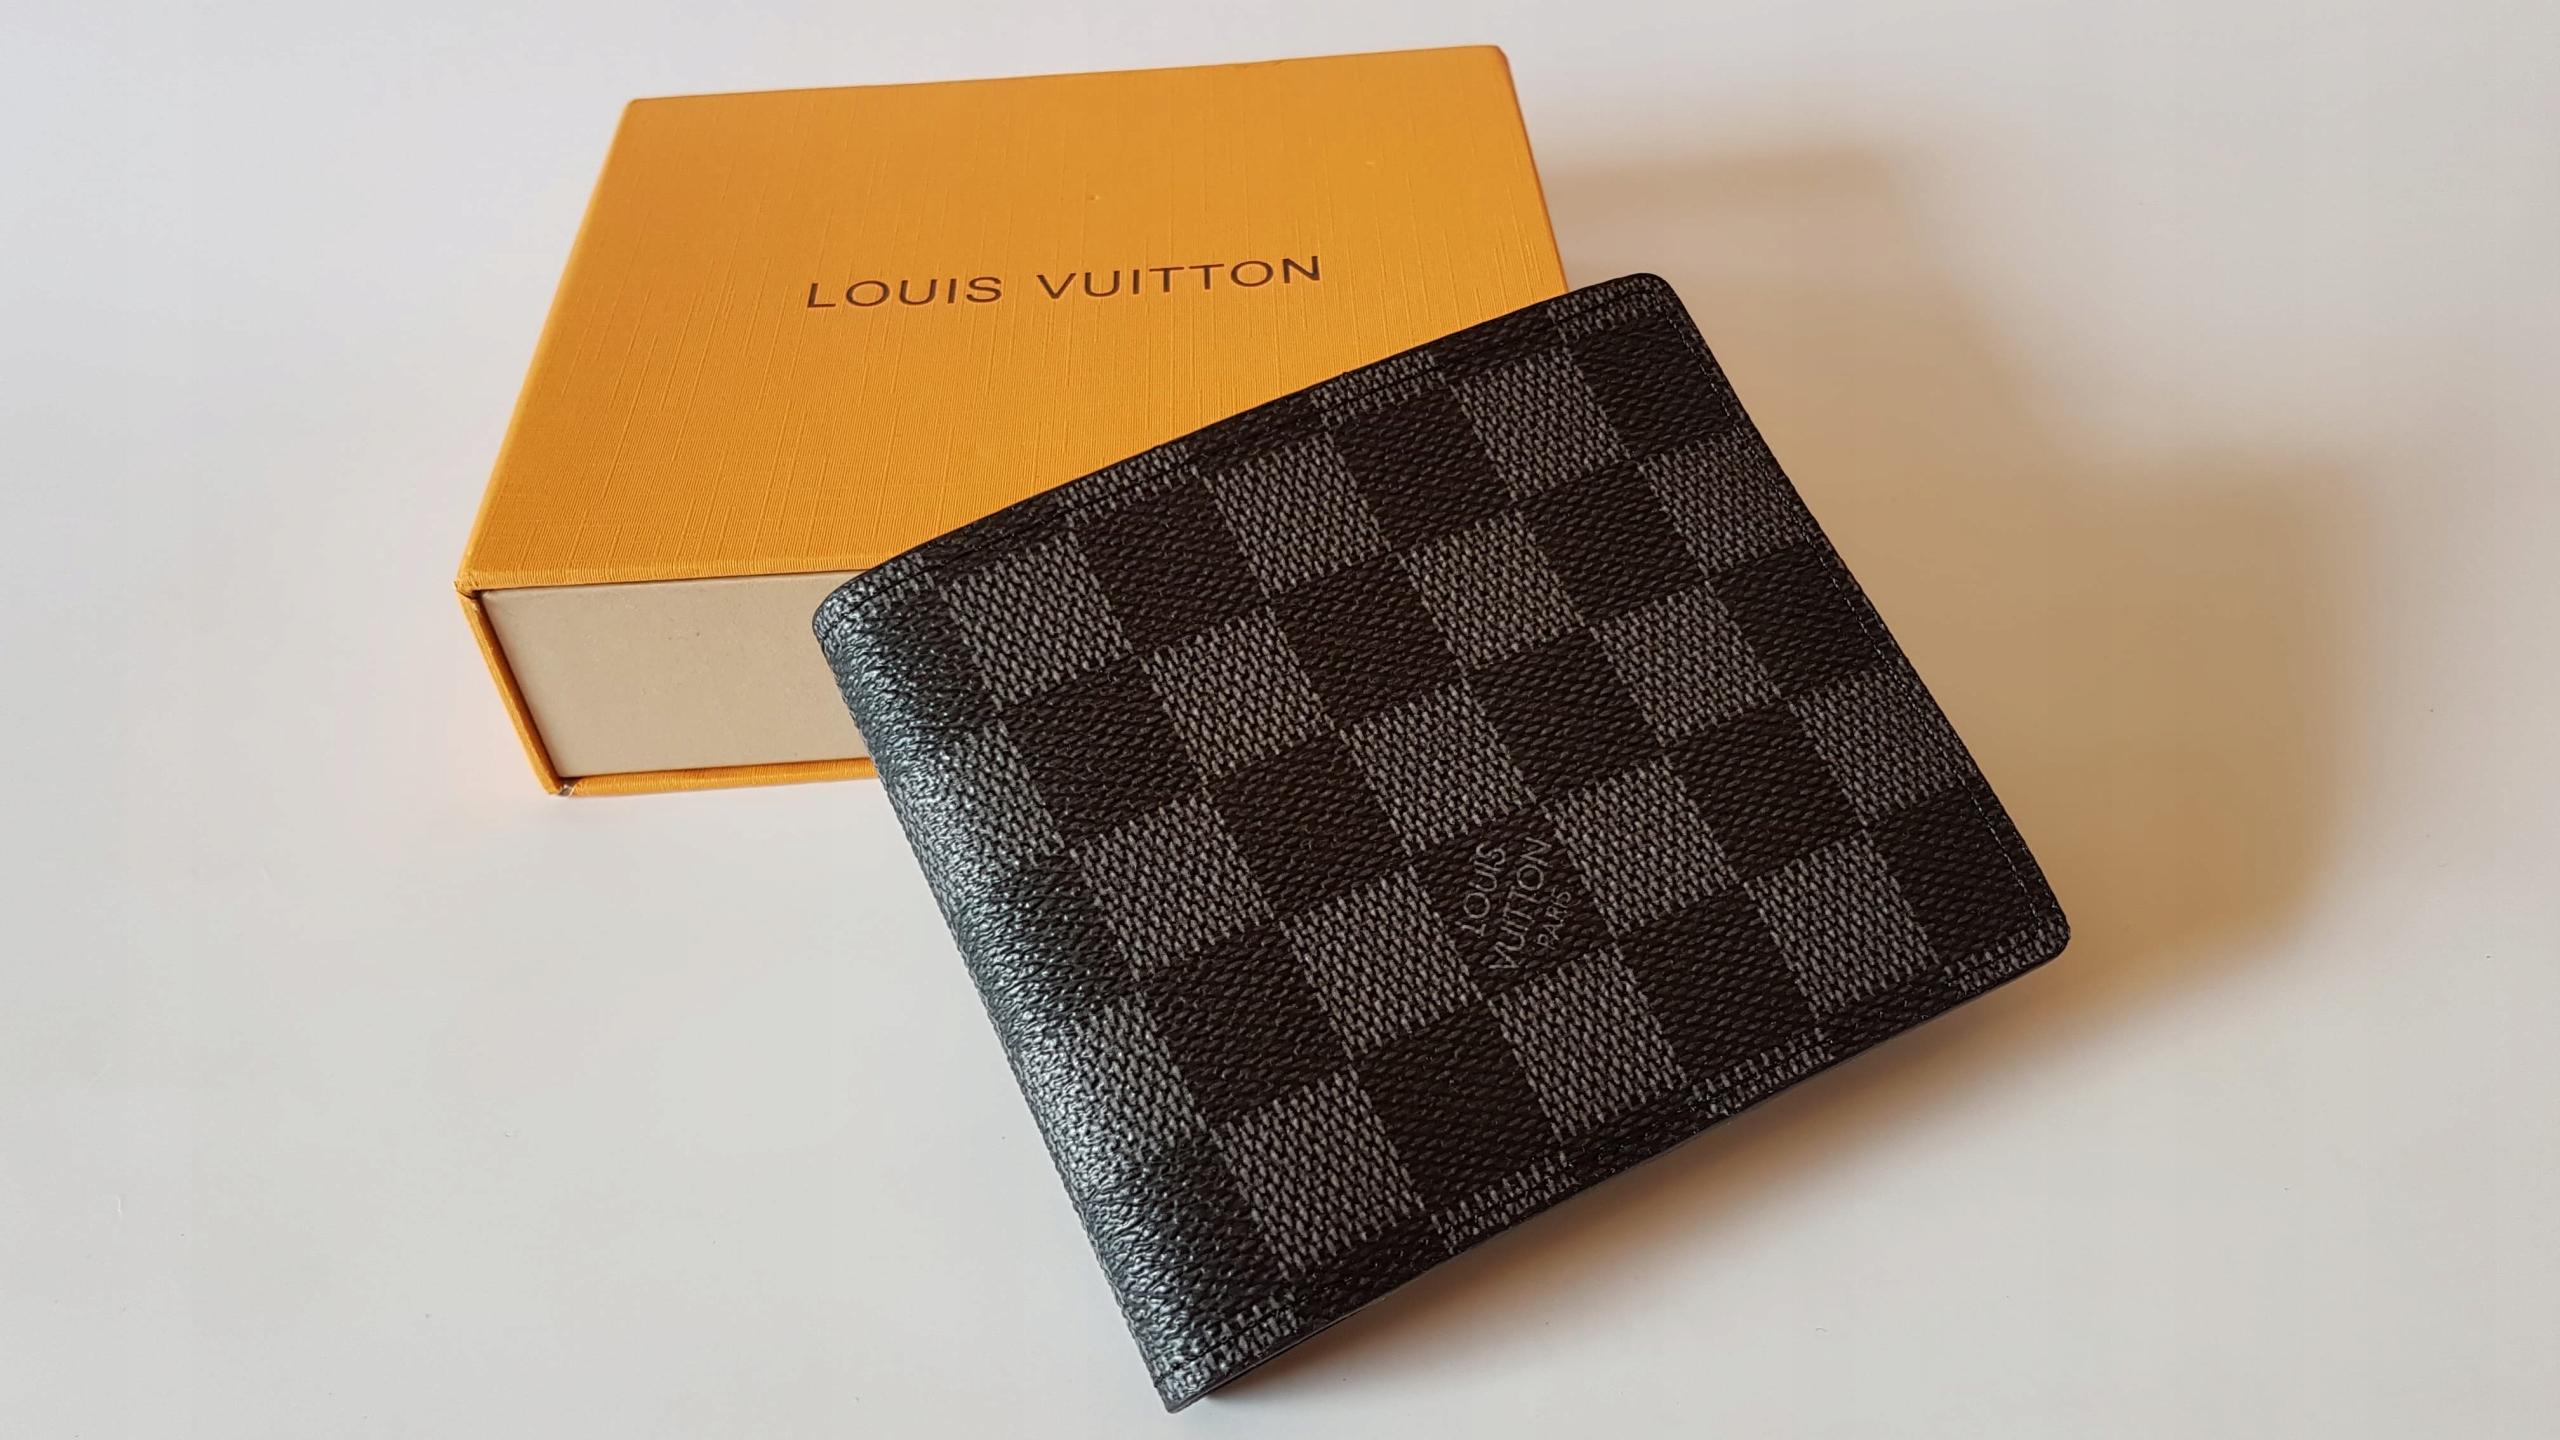 c11cb02d02e7e Męski portfel LV Louis Vuitton Czarna Krata #LV - 7623872773 ...